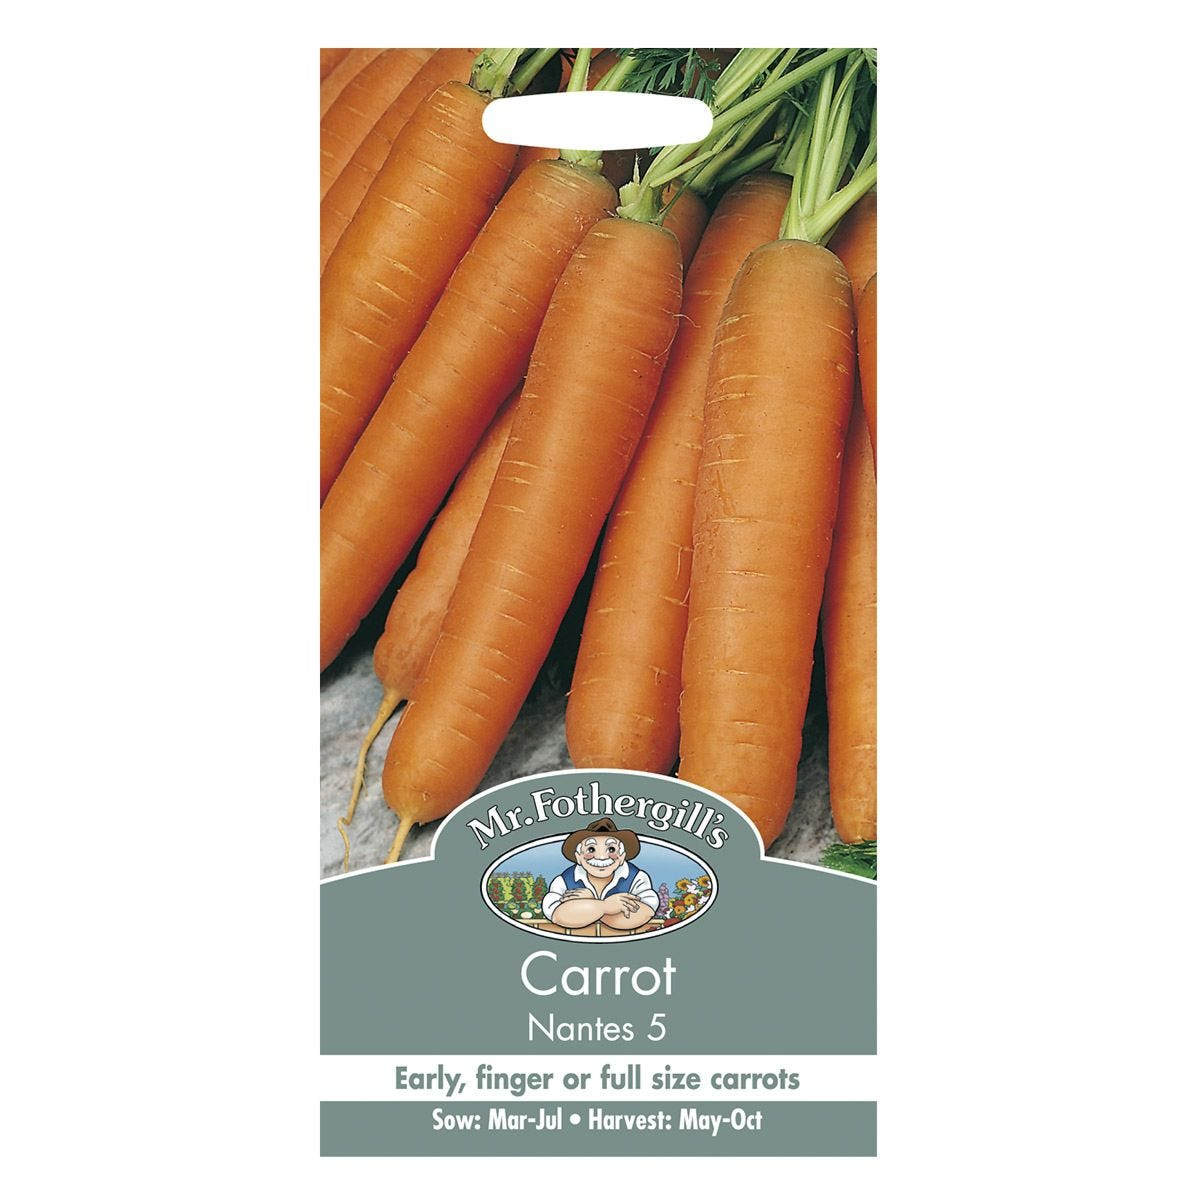 Mr Fothergill's Carrot Nantes 5 Seeds